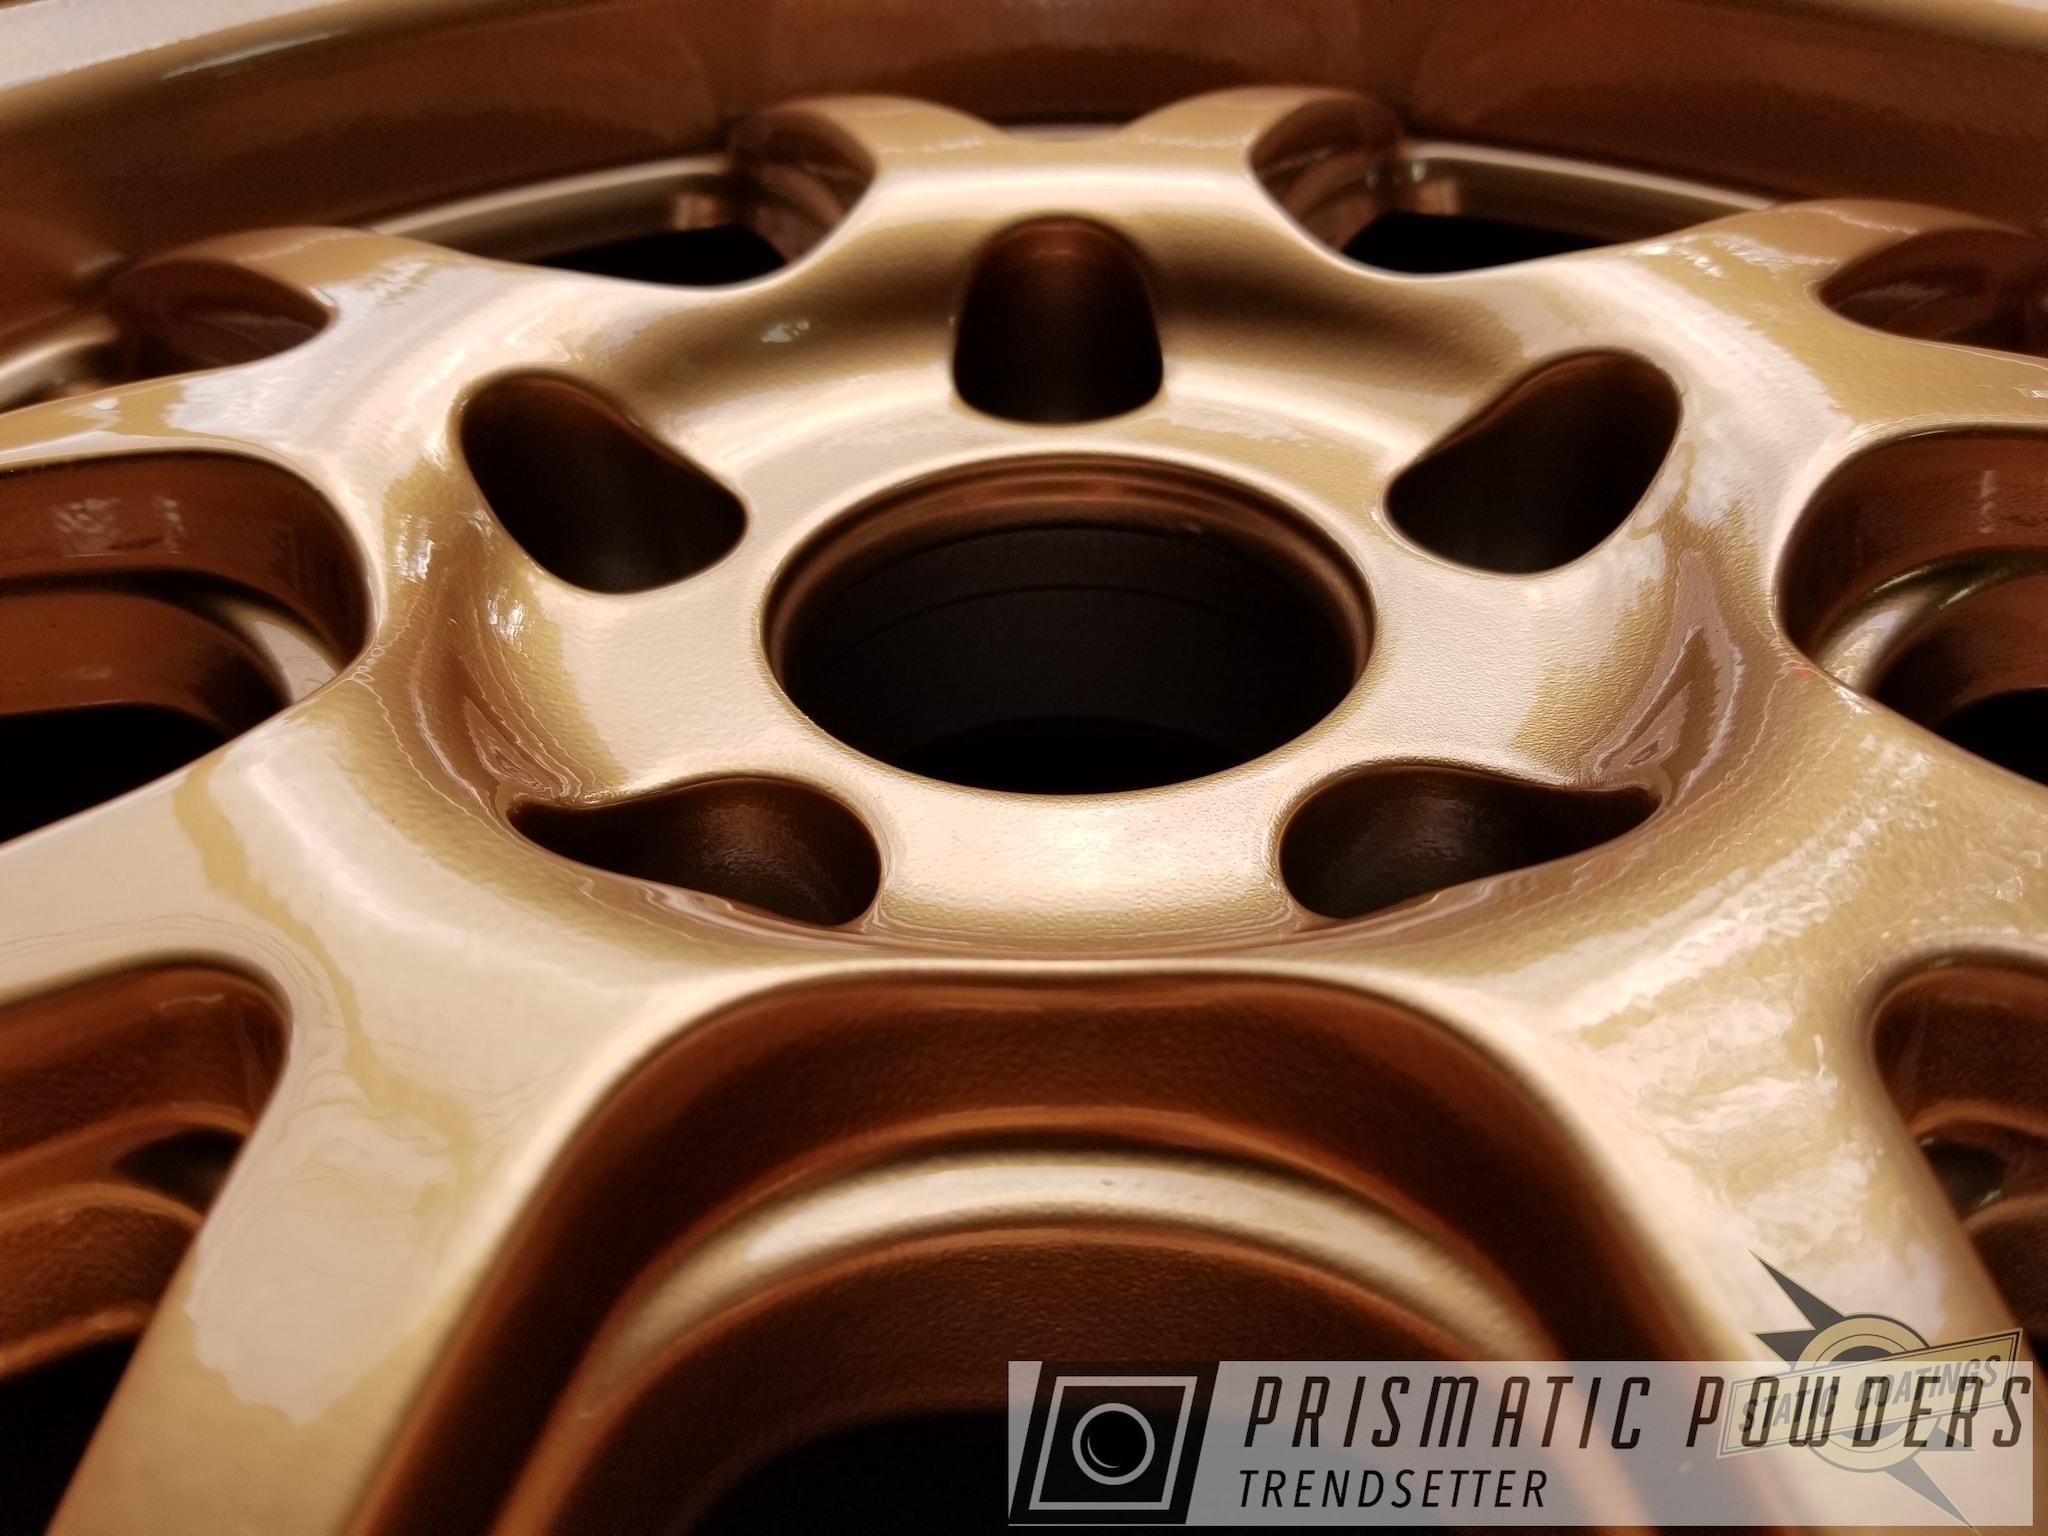 Powder Coating: Illusion True Copper PMB-10044,Wheels,Automotive,Clear Vision PPS-2974,Powder Coat Wheels